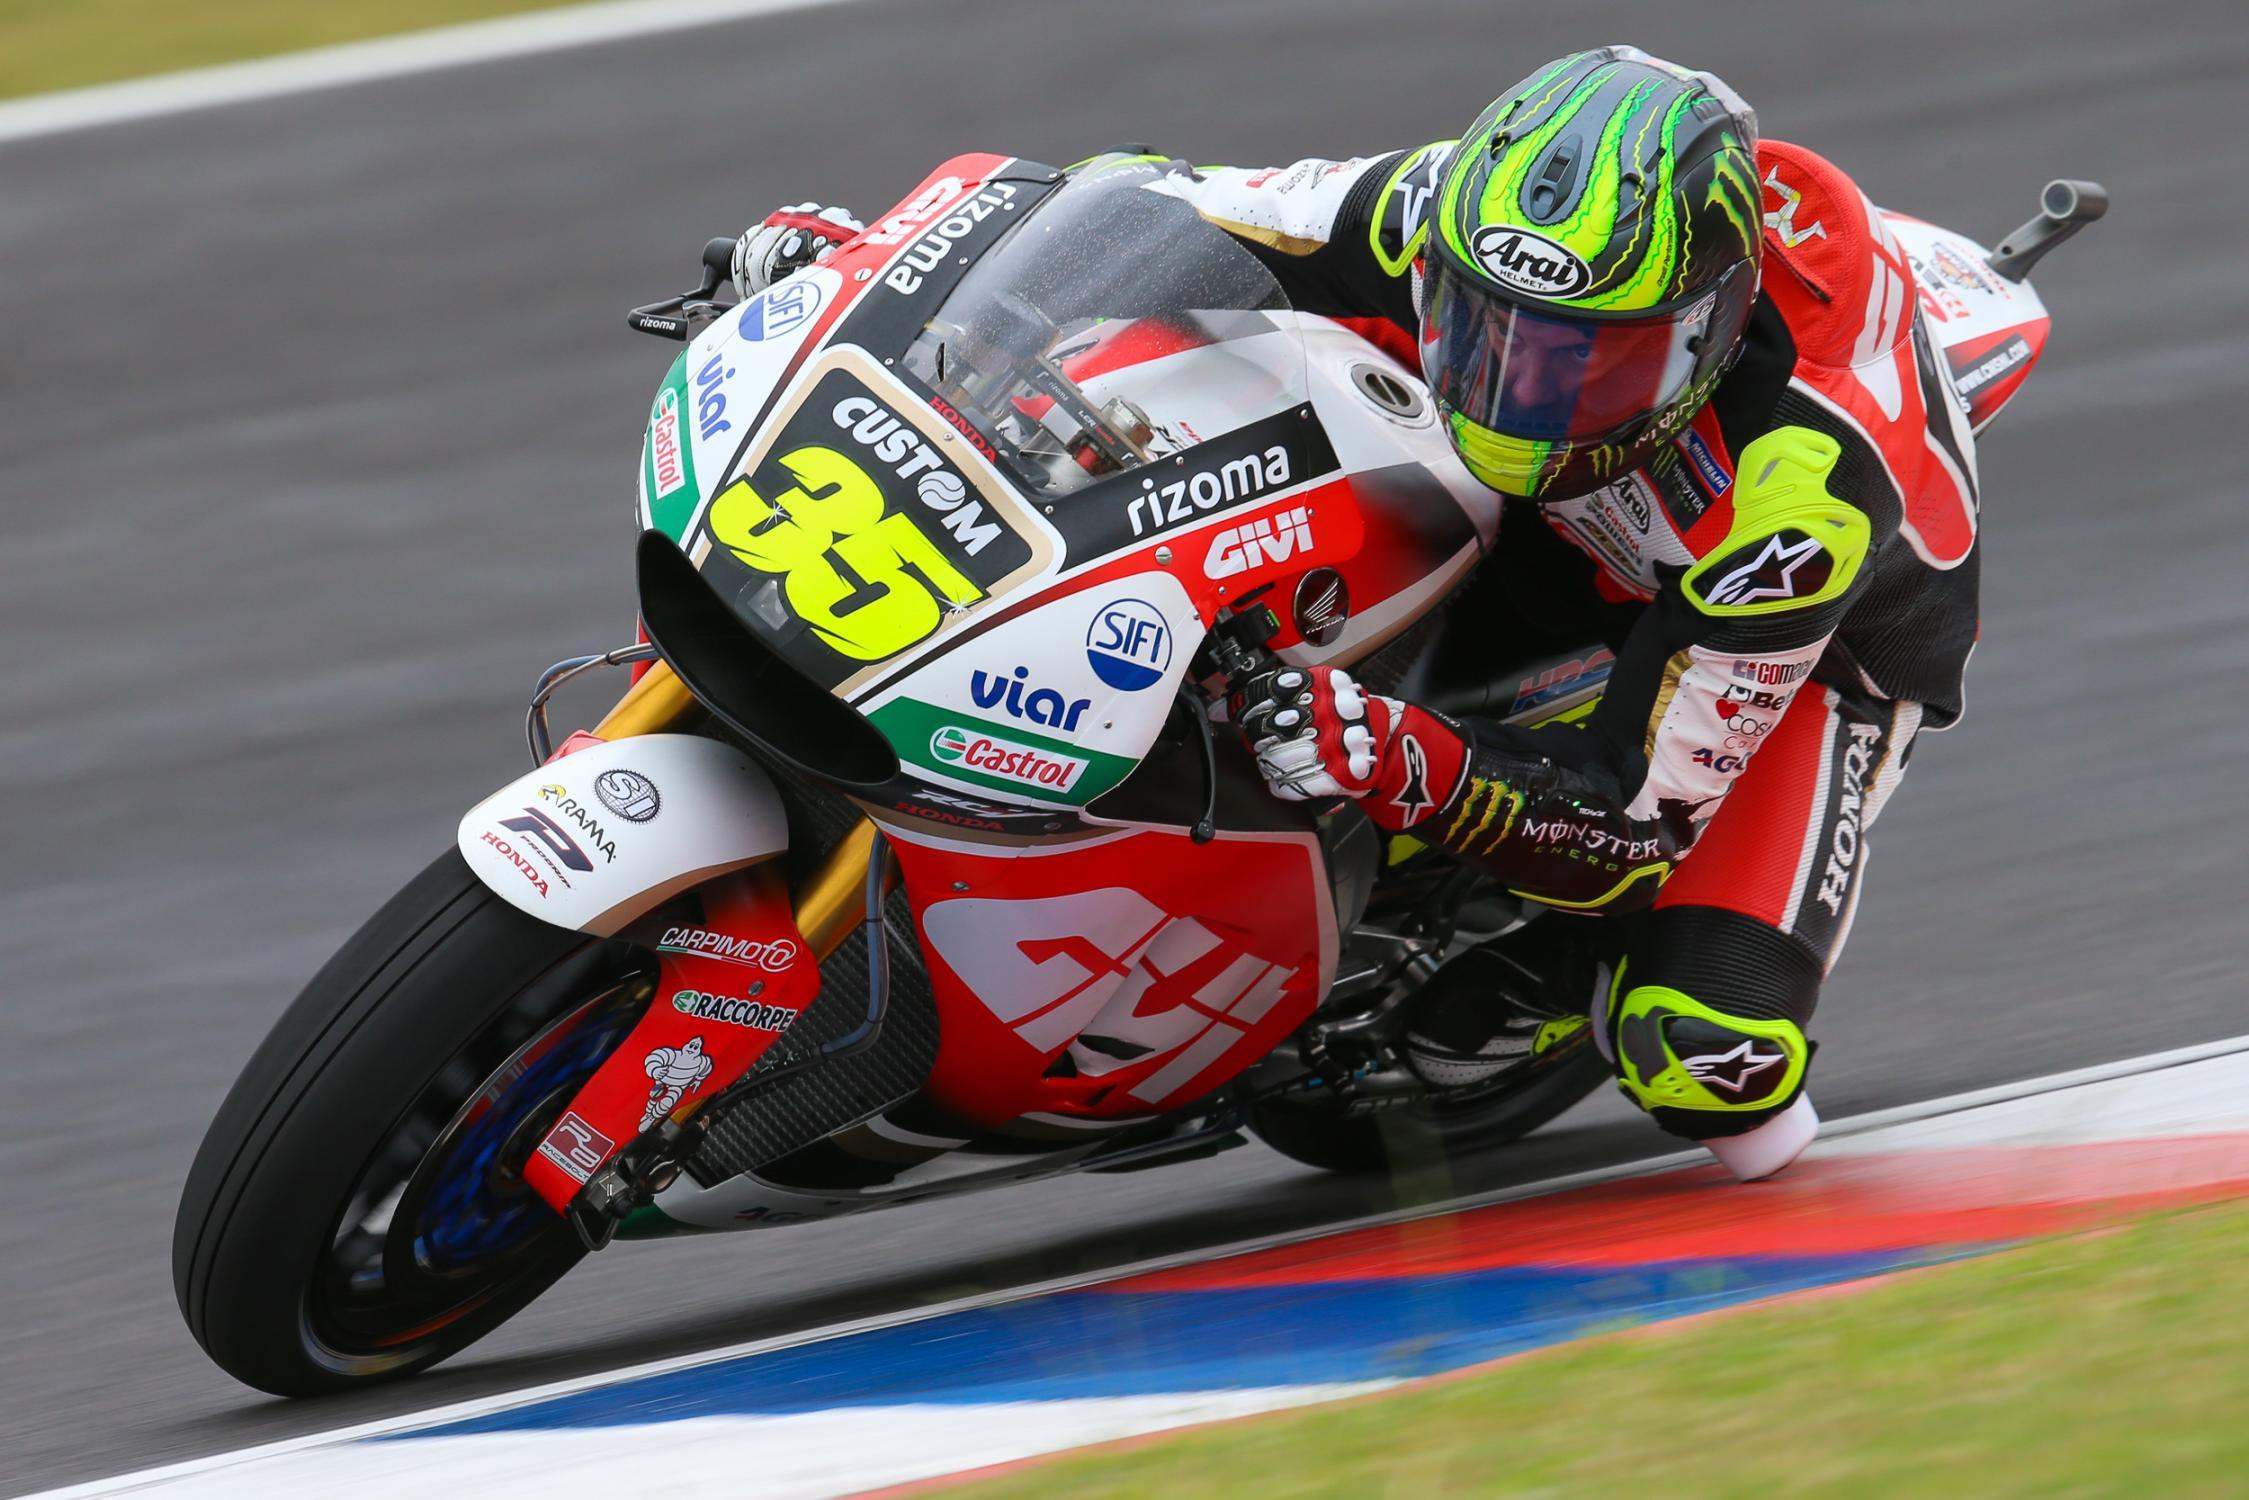 [MotoGP] Argentine 35-cal-crutchlow-engbl1_1213.gallery_full_top_fullscreen